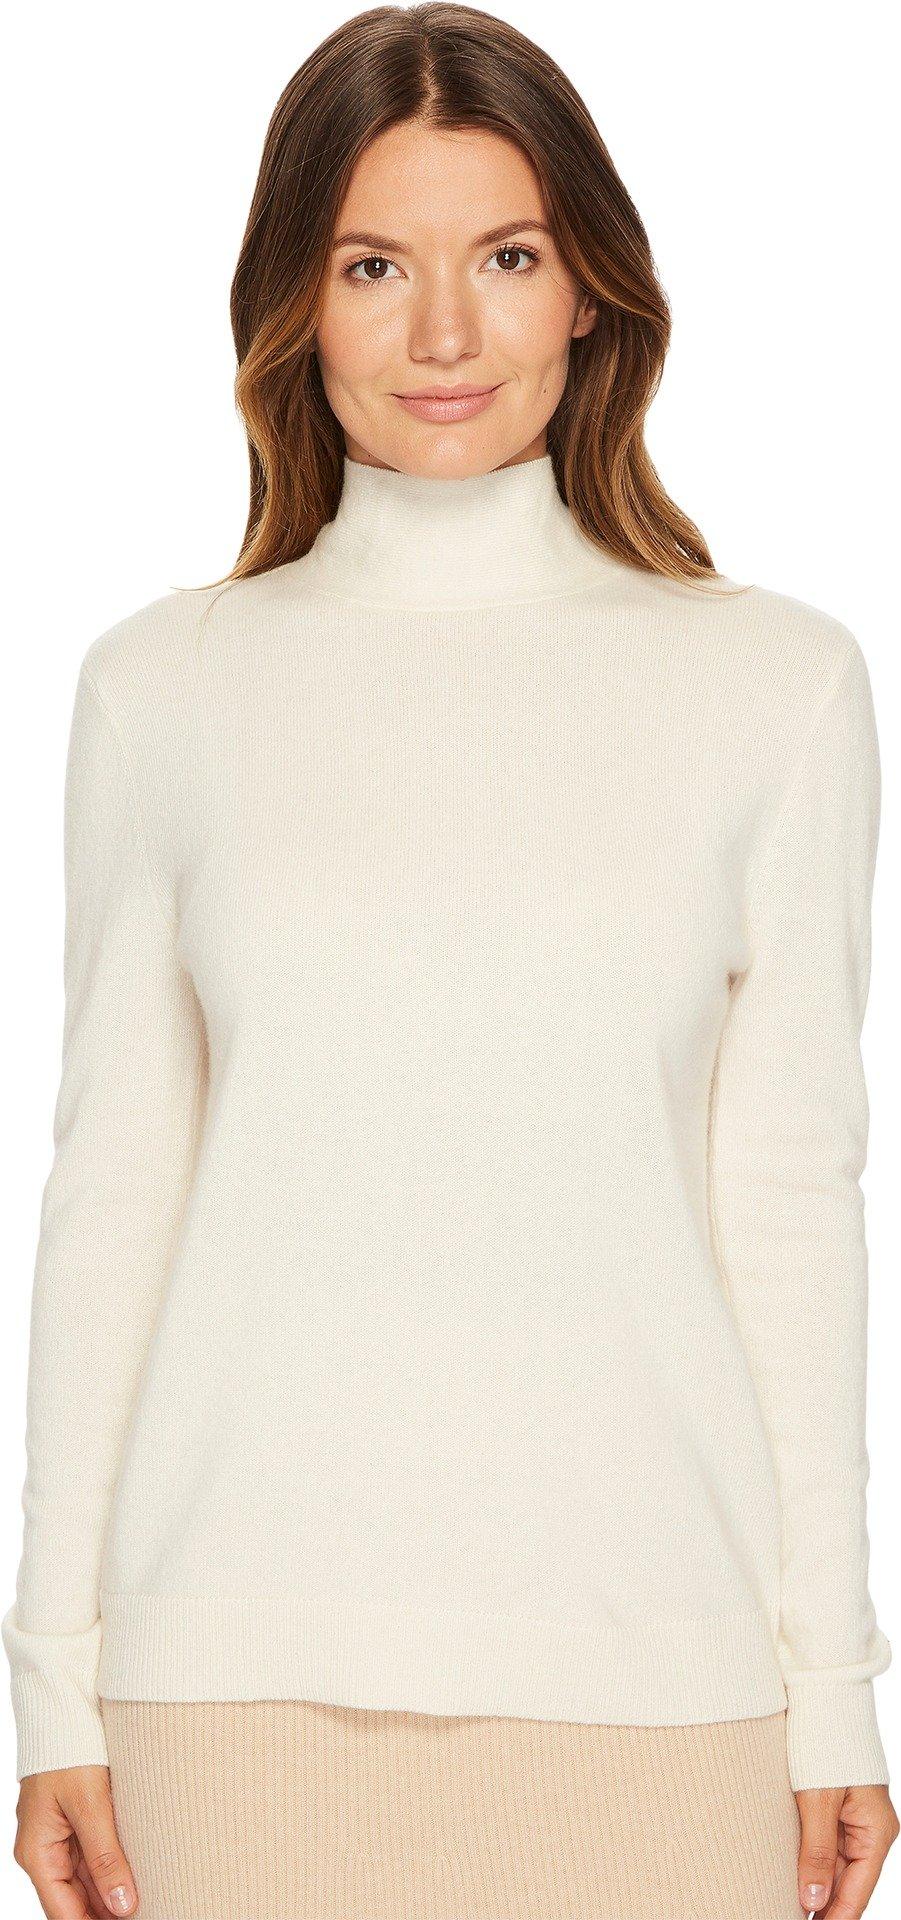 Cashmere In Love Women's Vera Pullover With Bowtie Vanilla Large